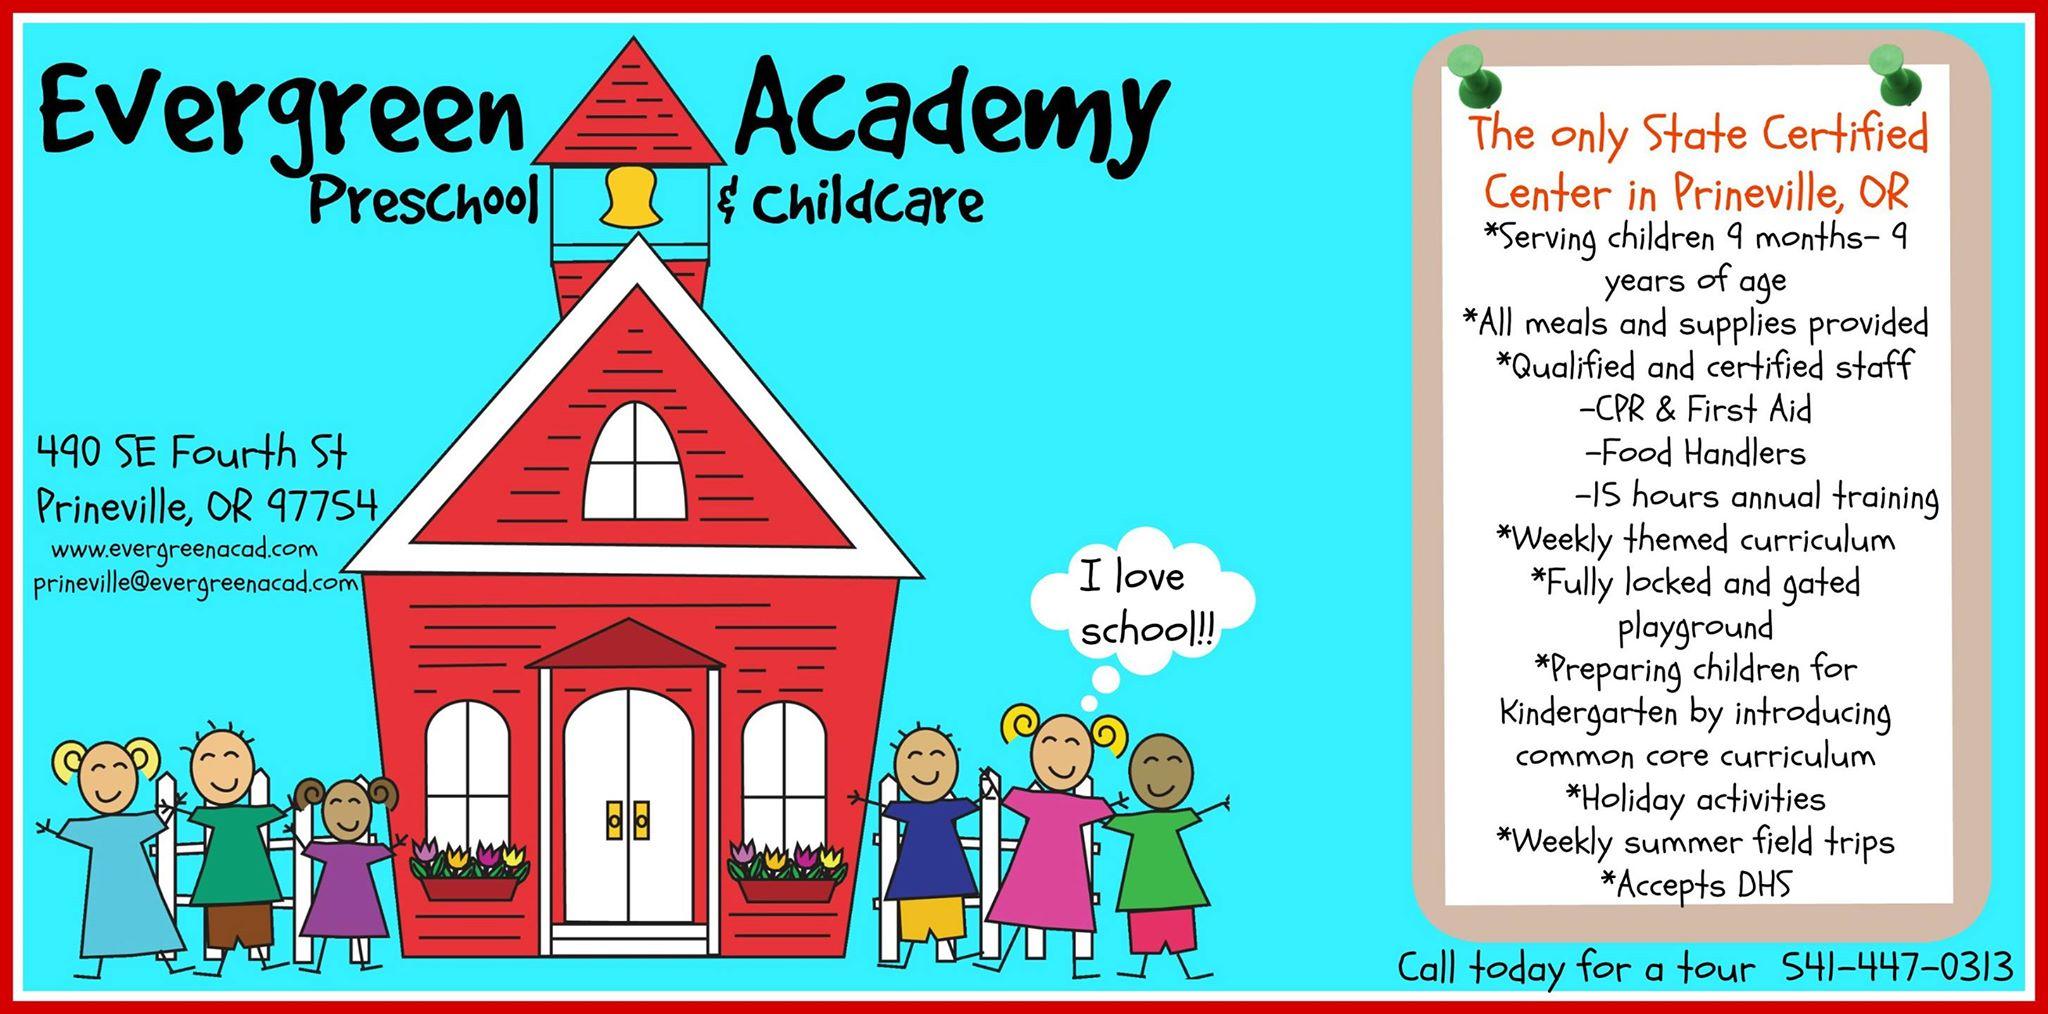 Evergreen Academy Preschool & Childcare, Prineville